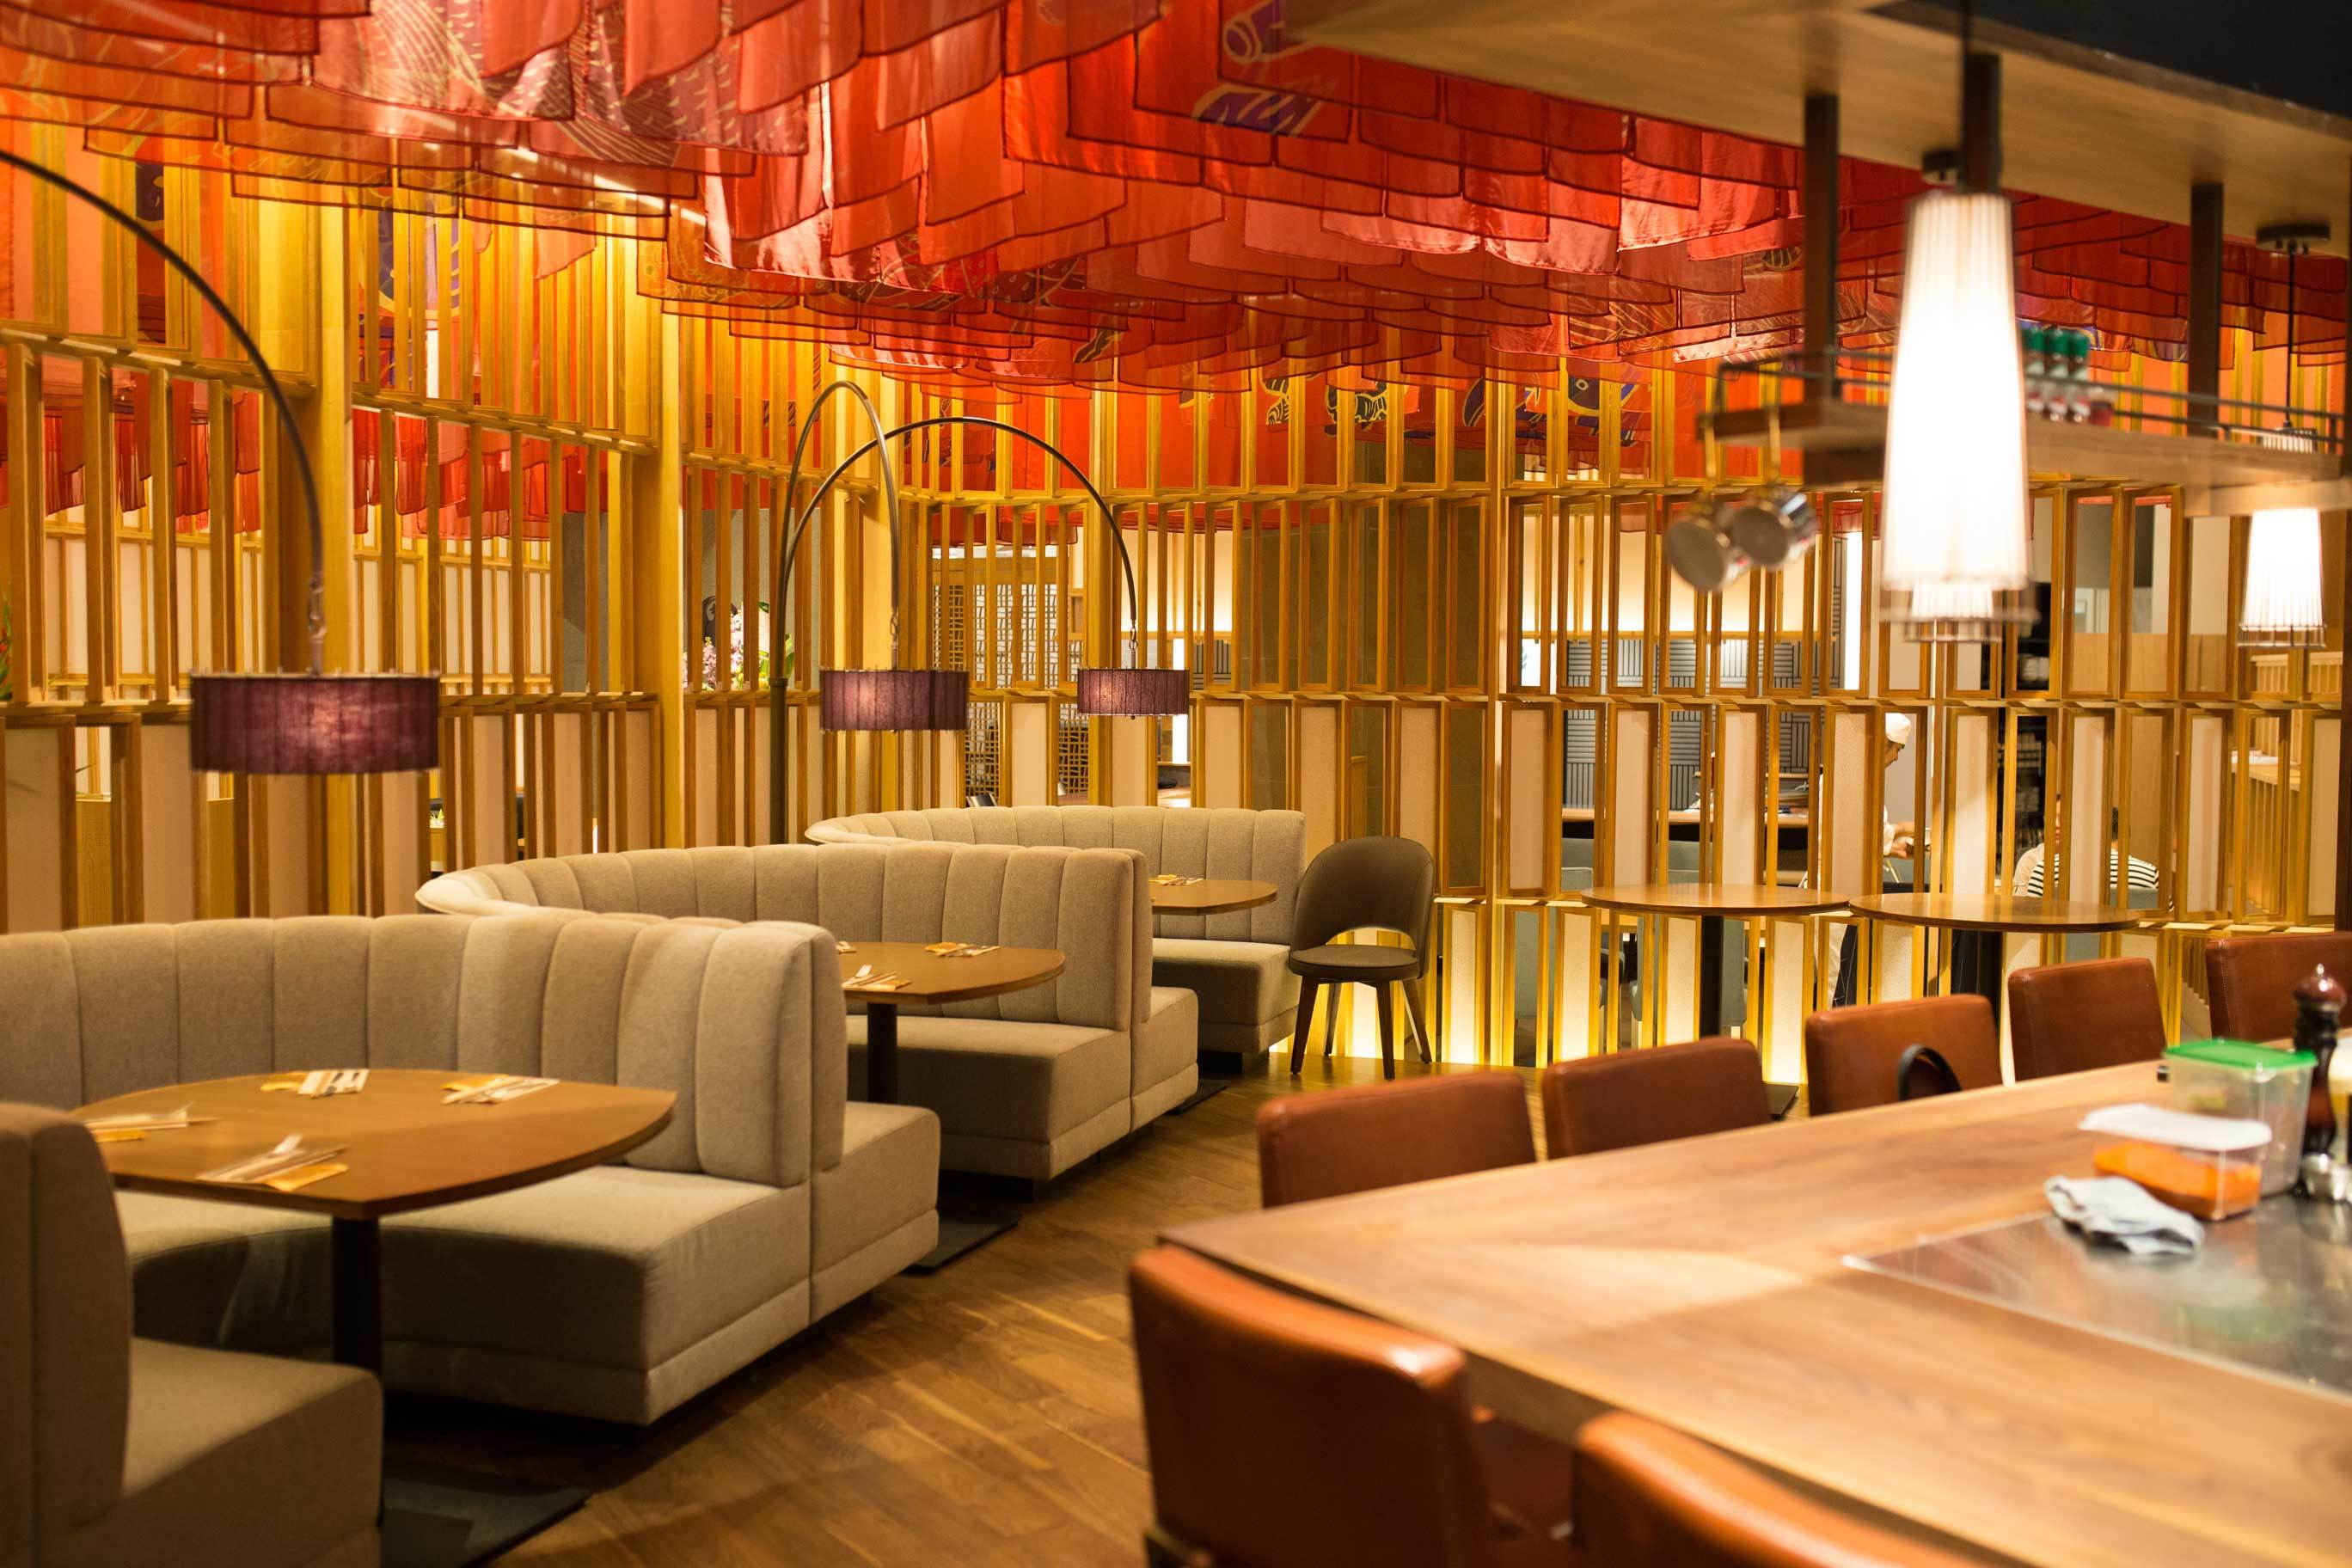 The Tokyo Restaurant